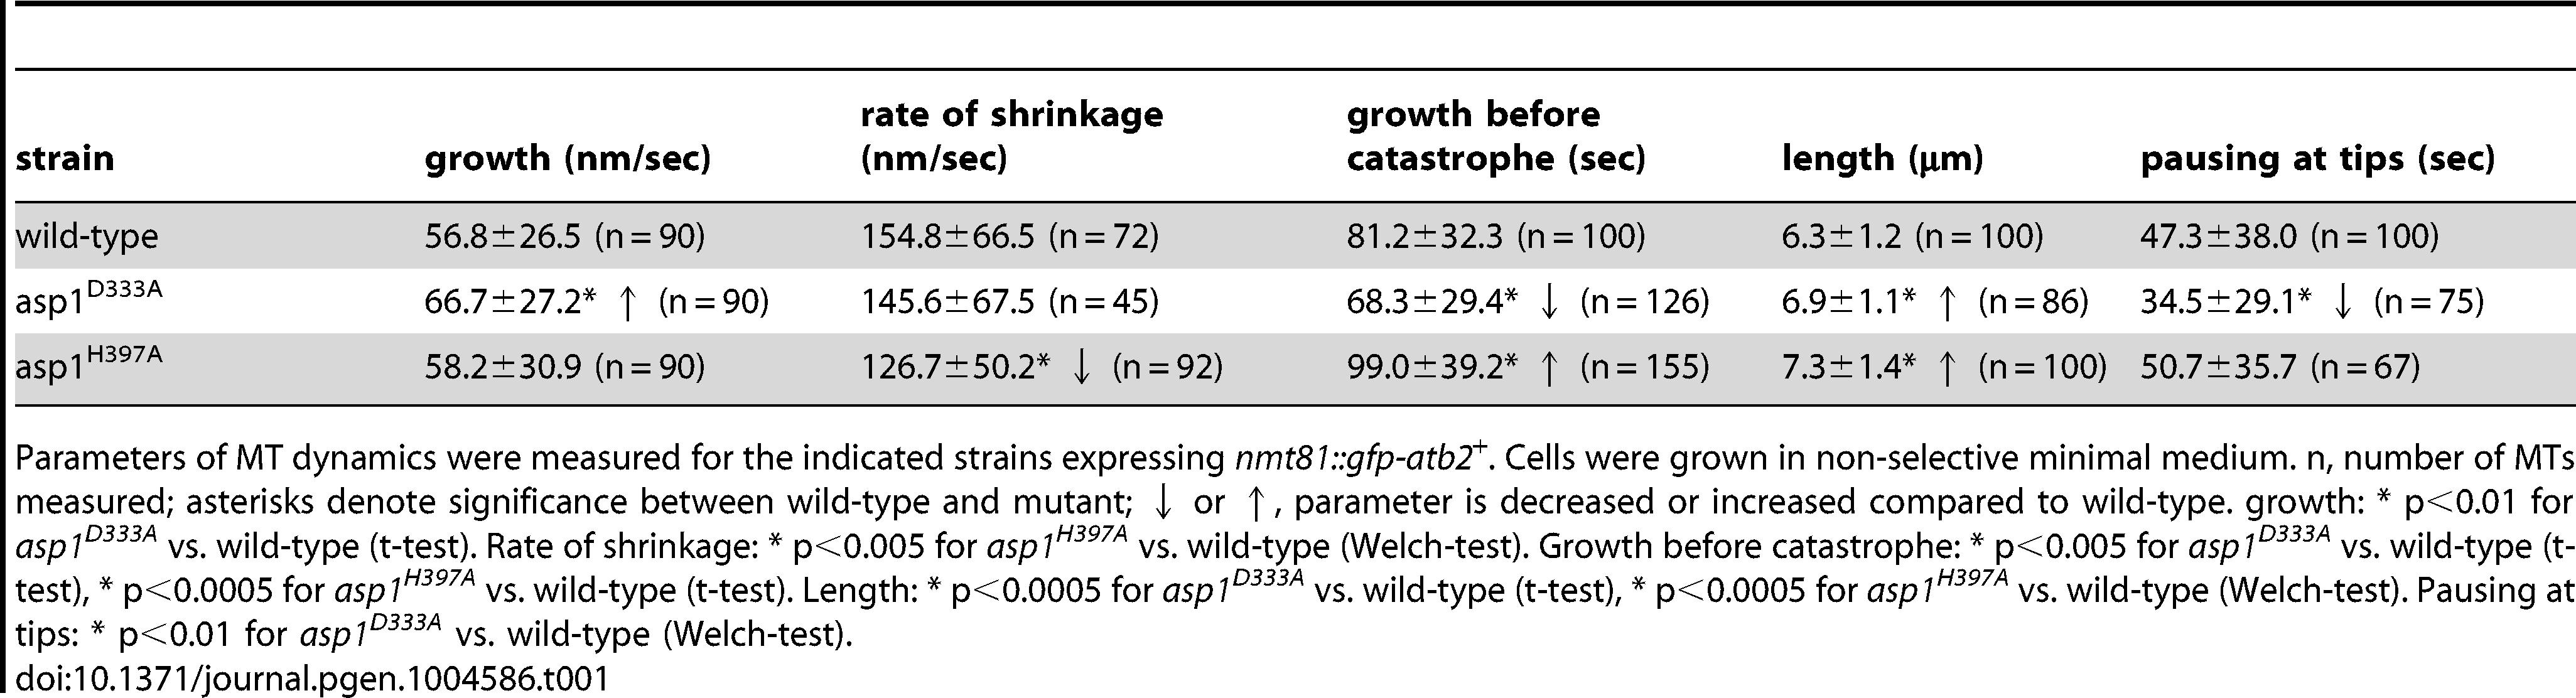 Interphase MT dynamics in <i>asp1</i> variant strains.